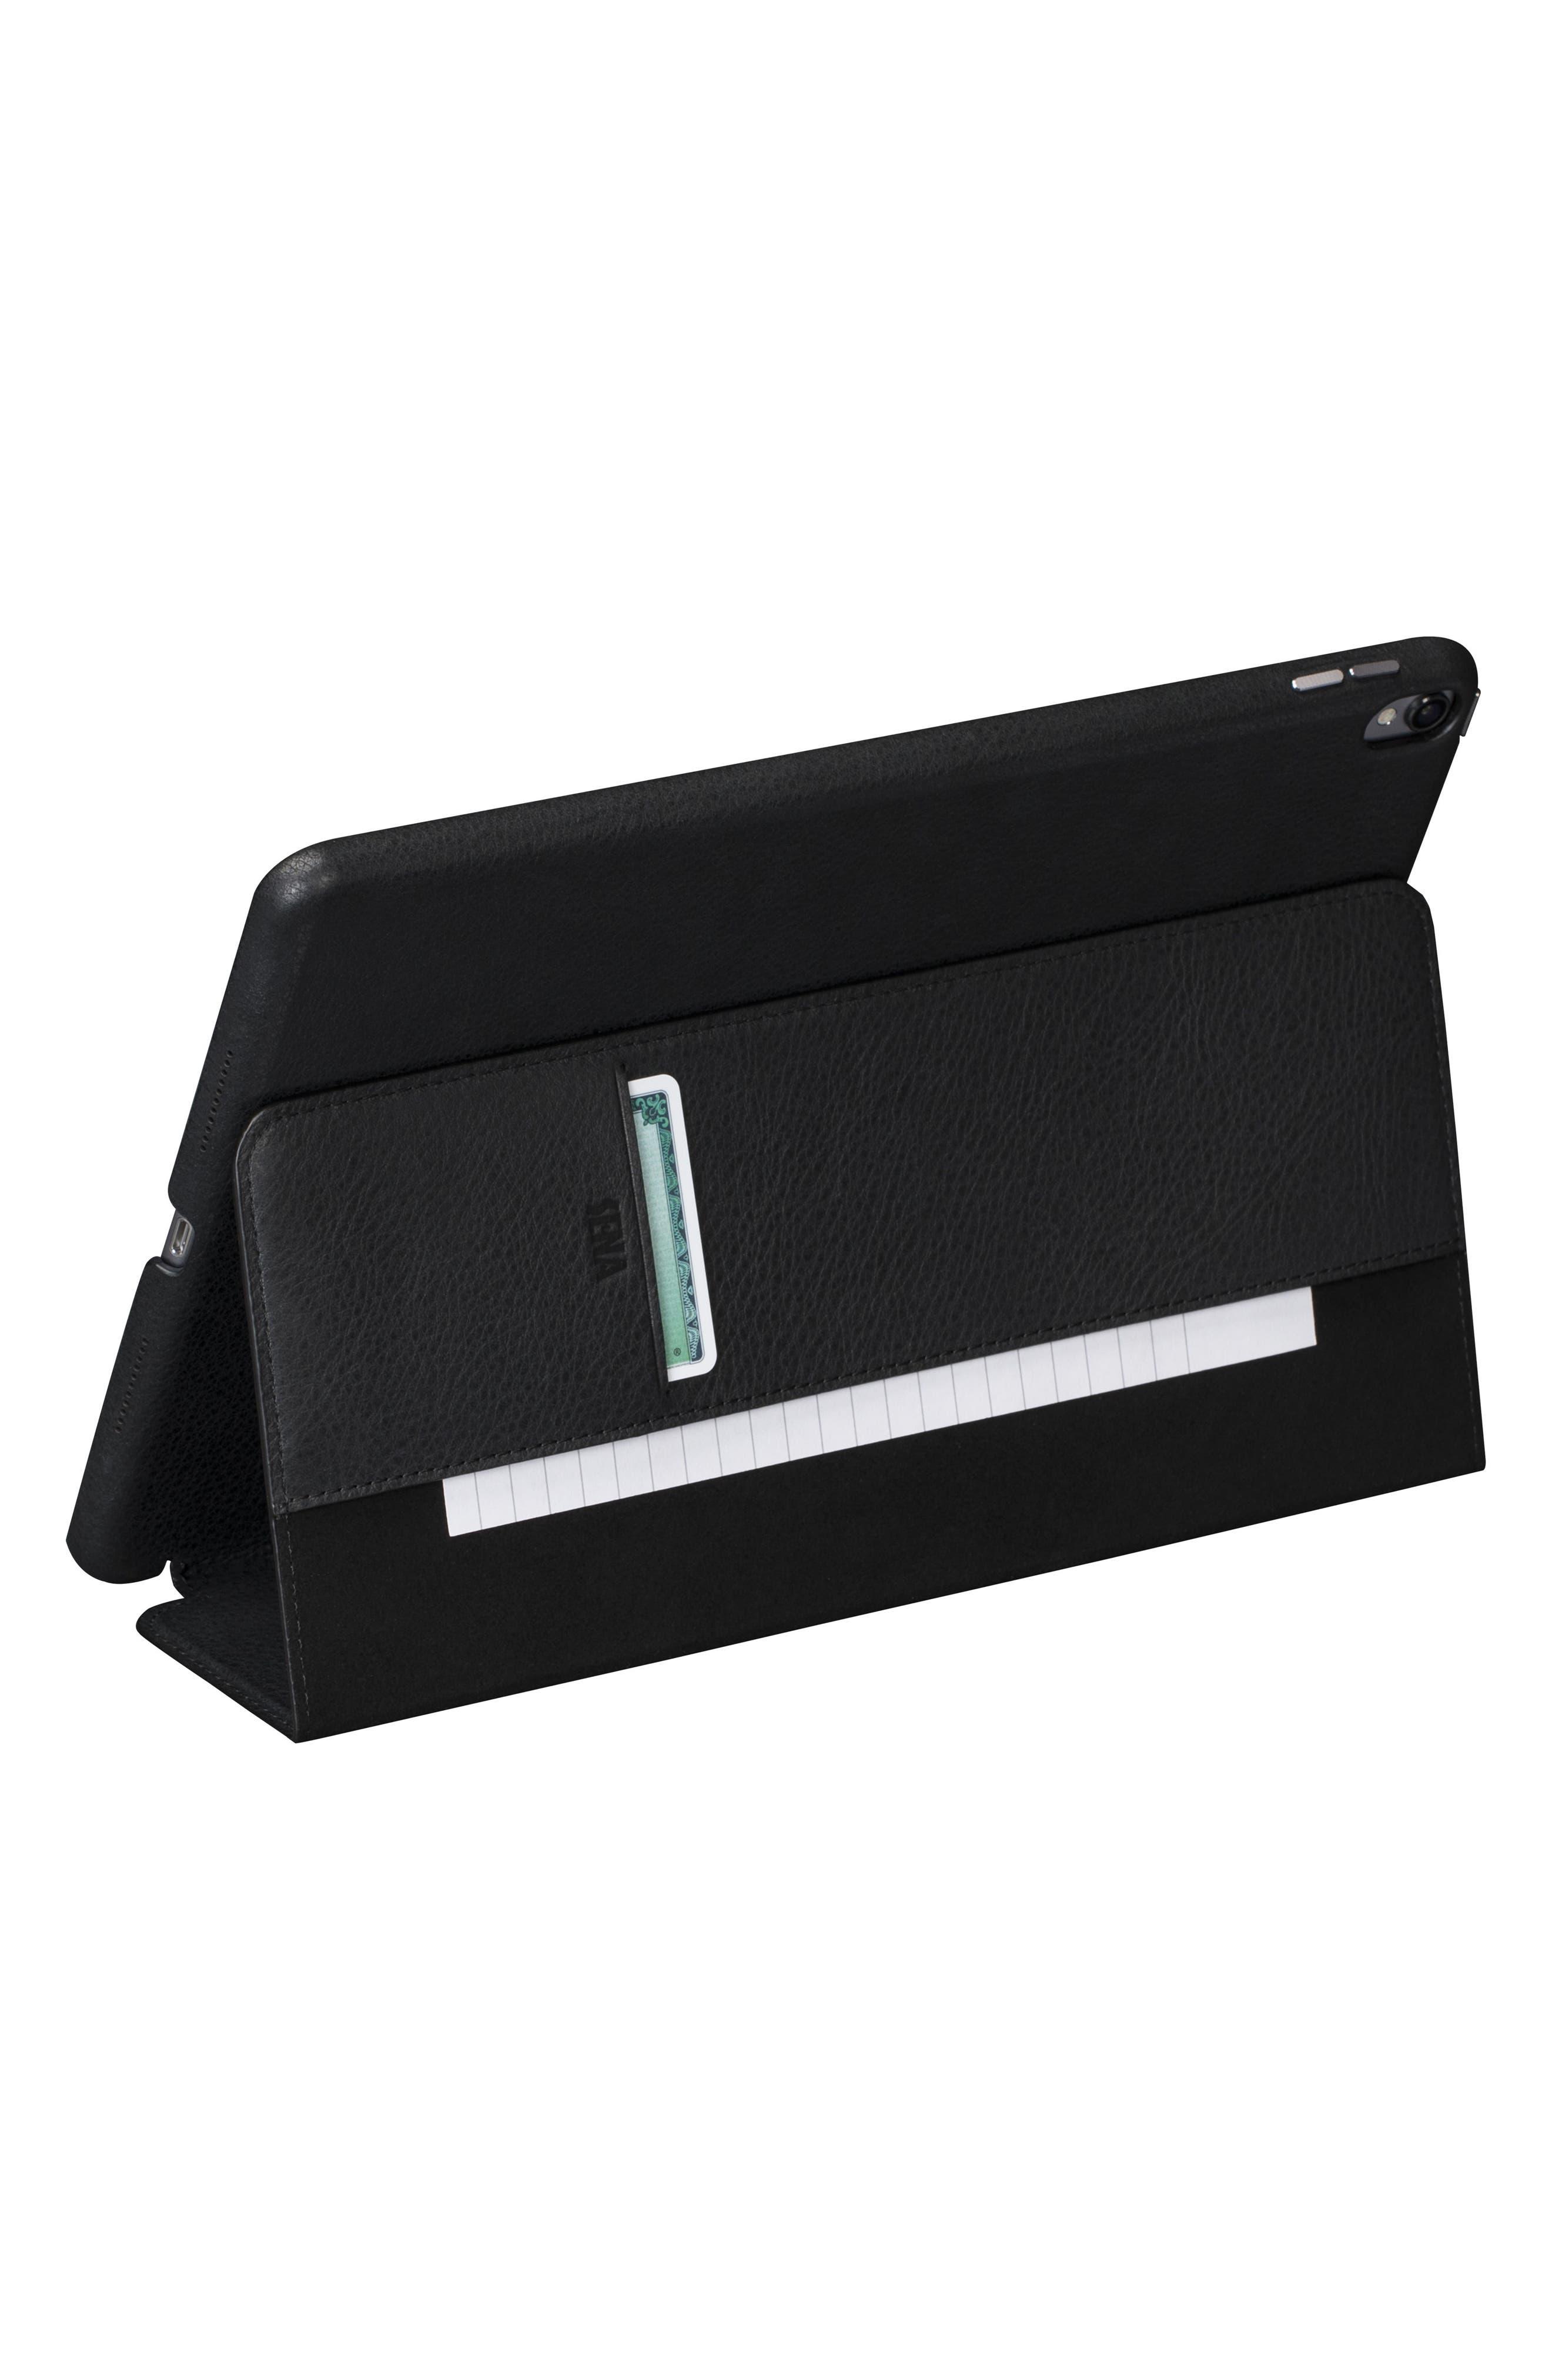 Futurefolio iPad Pro 10.5 Case,                             Alternate thumbnail 3, color,                             BLACK